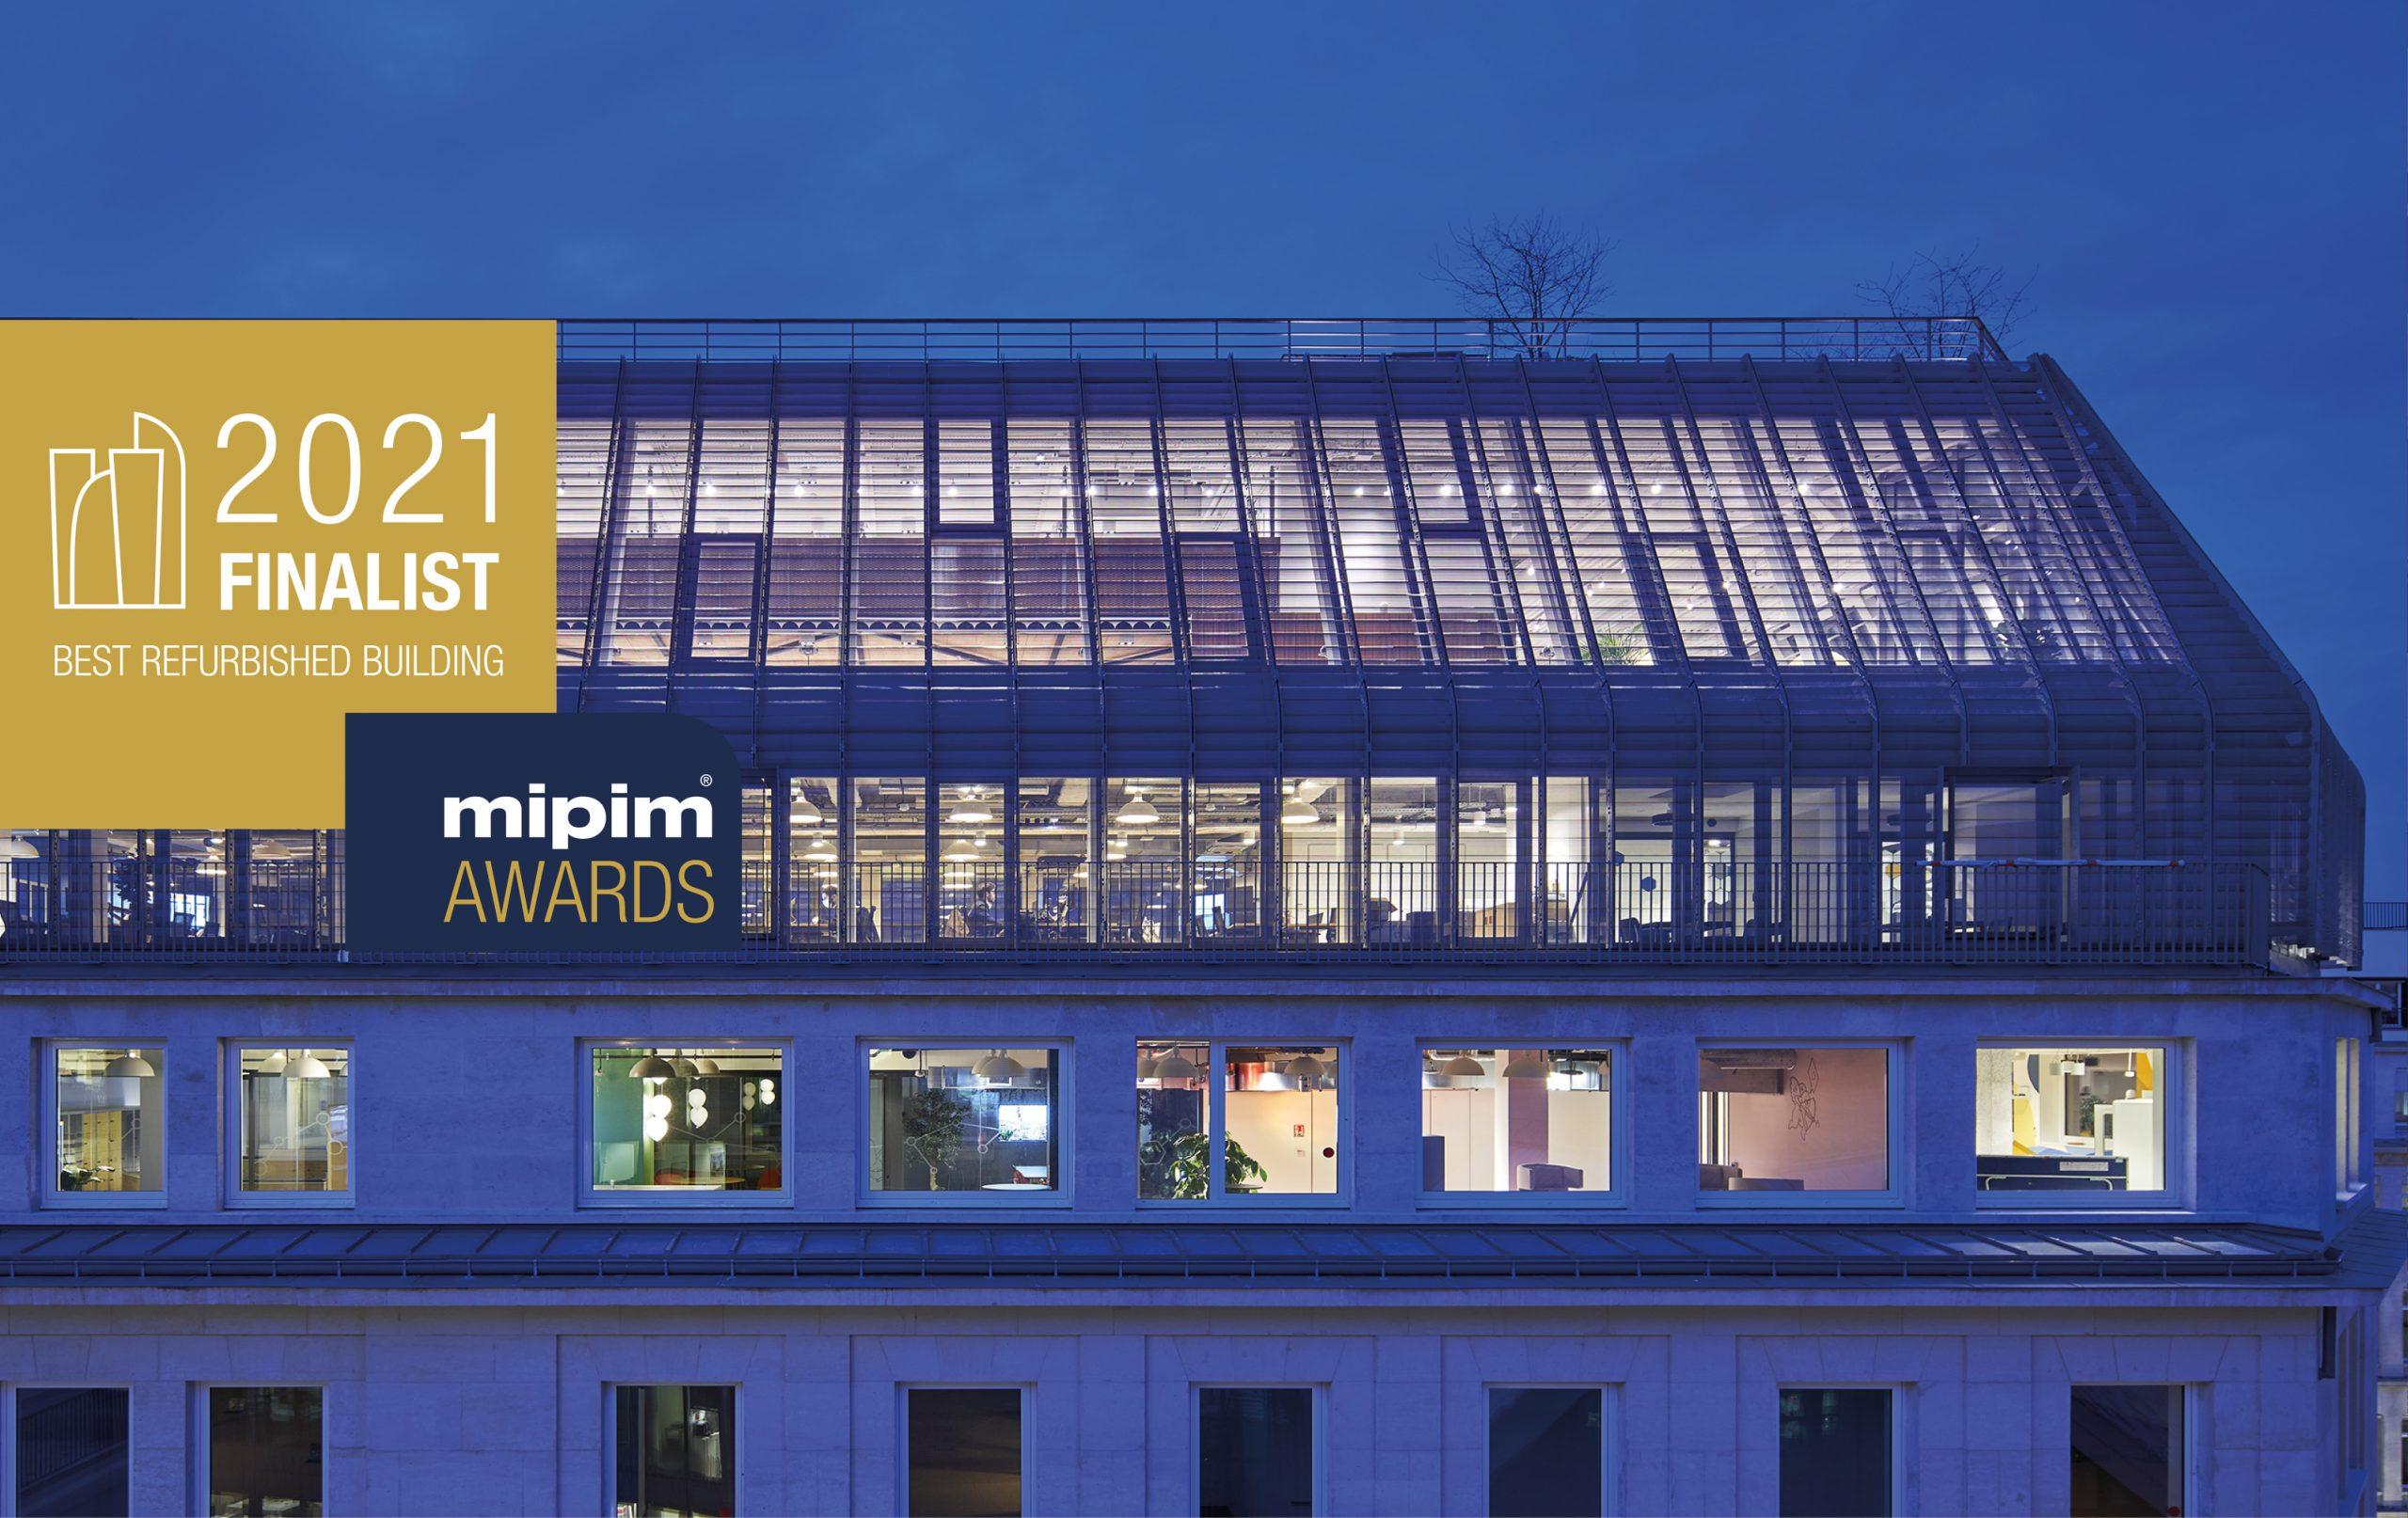 7 Madrid nominated for 2021 MIPIM Awards